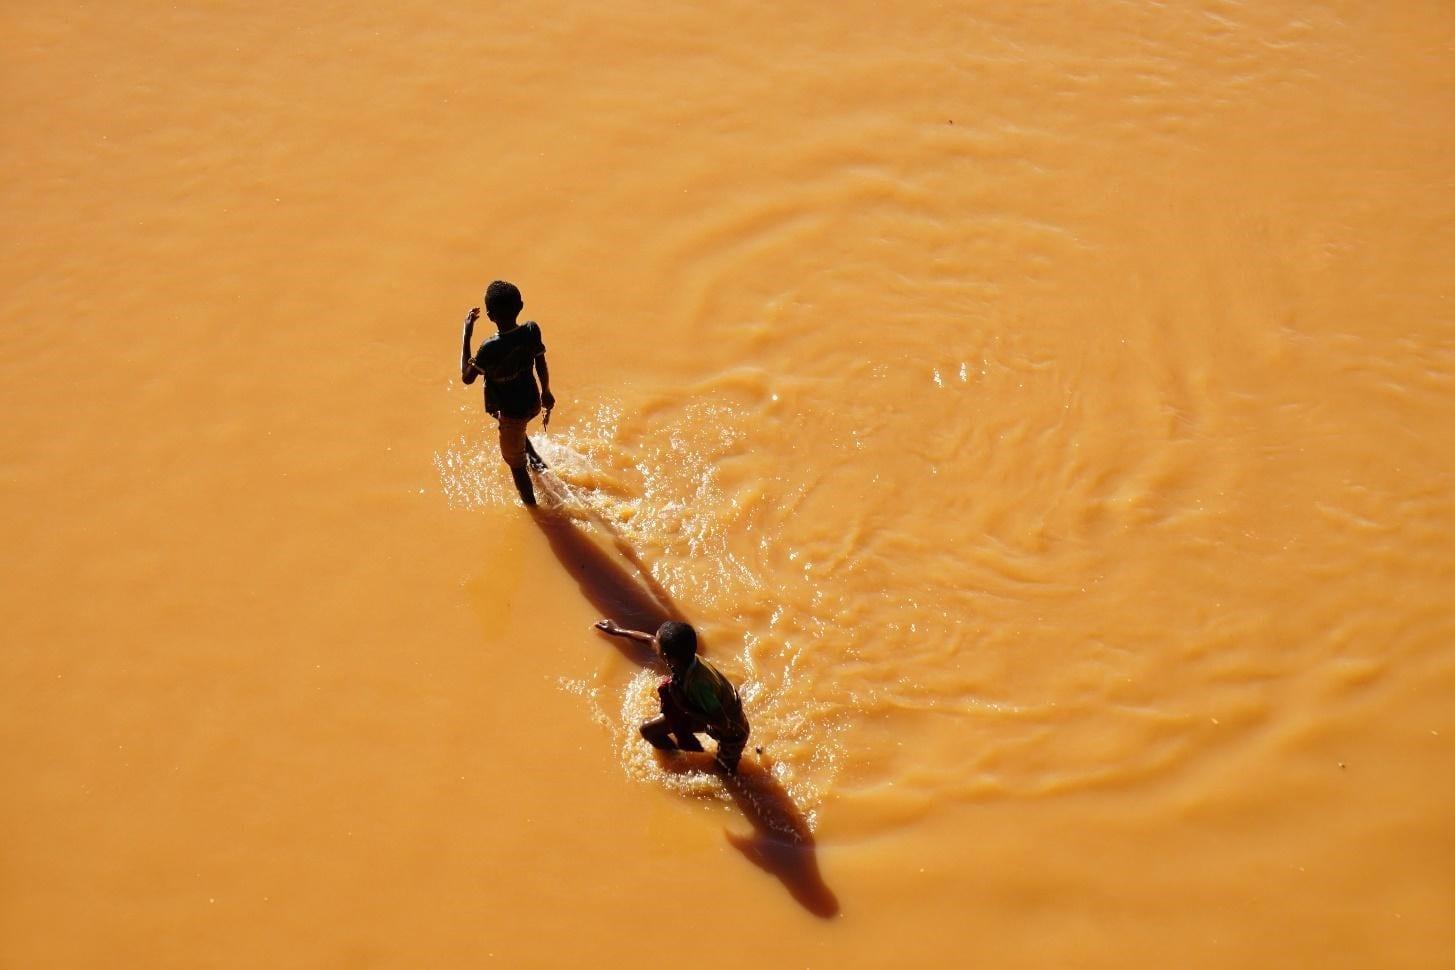 Madagascars rivers